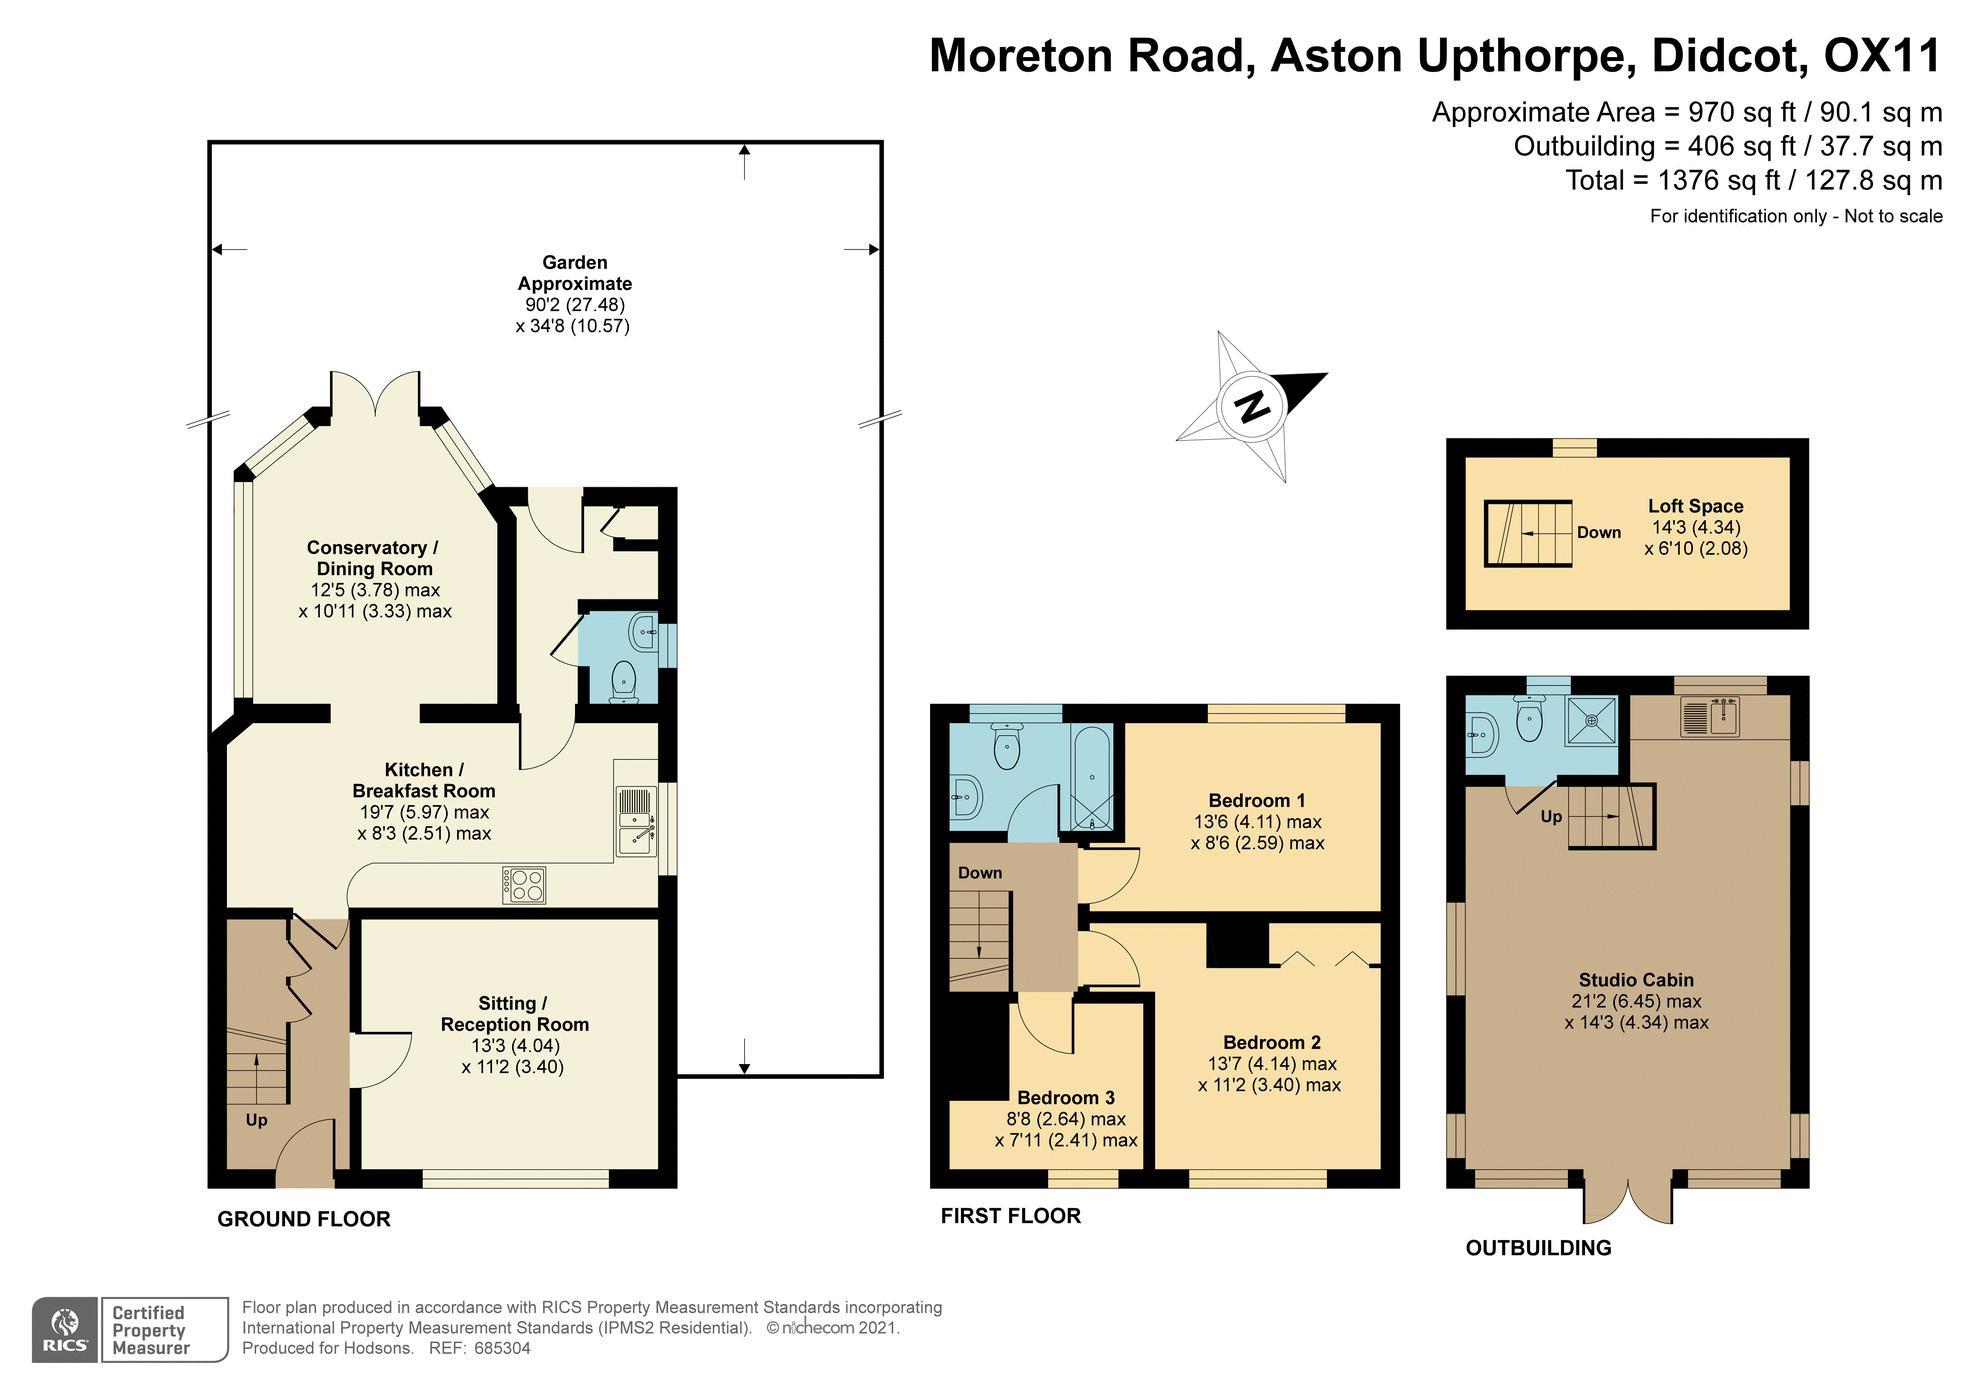 Moreton Road Aston Upthorpe